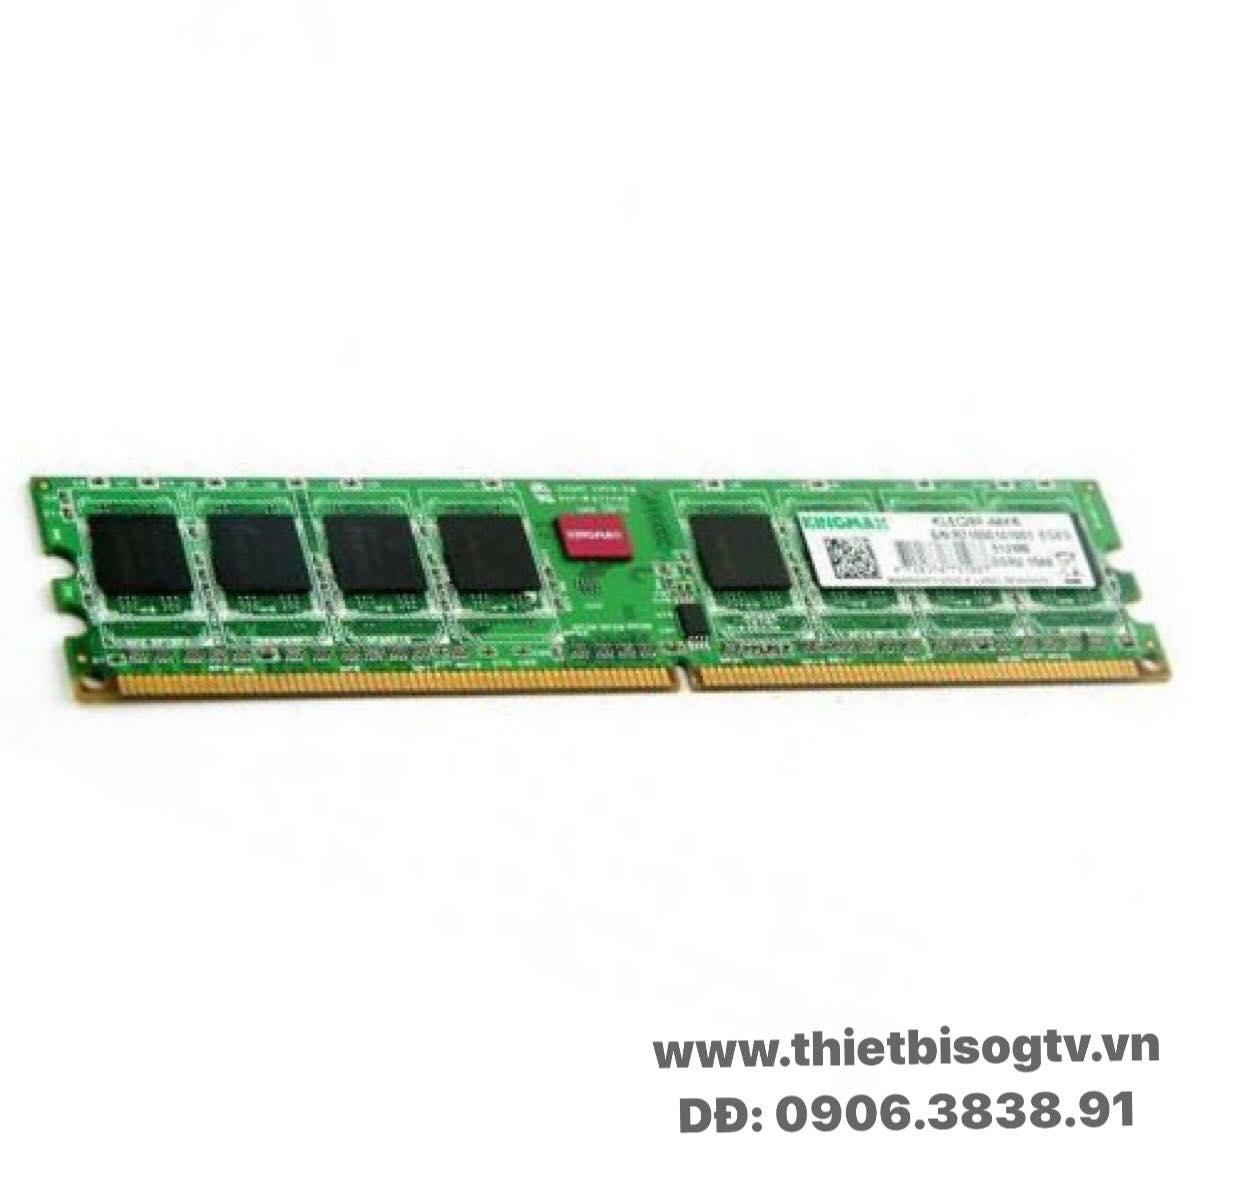 Bộ nhớ DDR3 Kingmax 8GB bus 1600